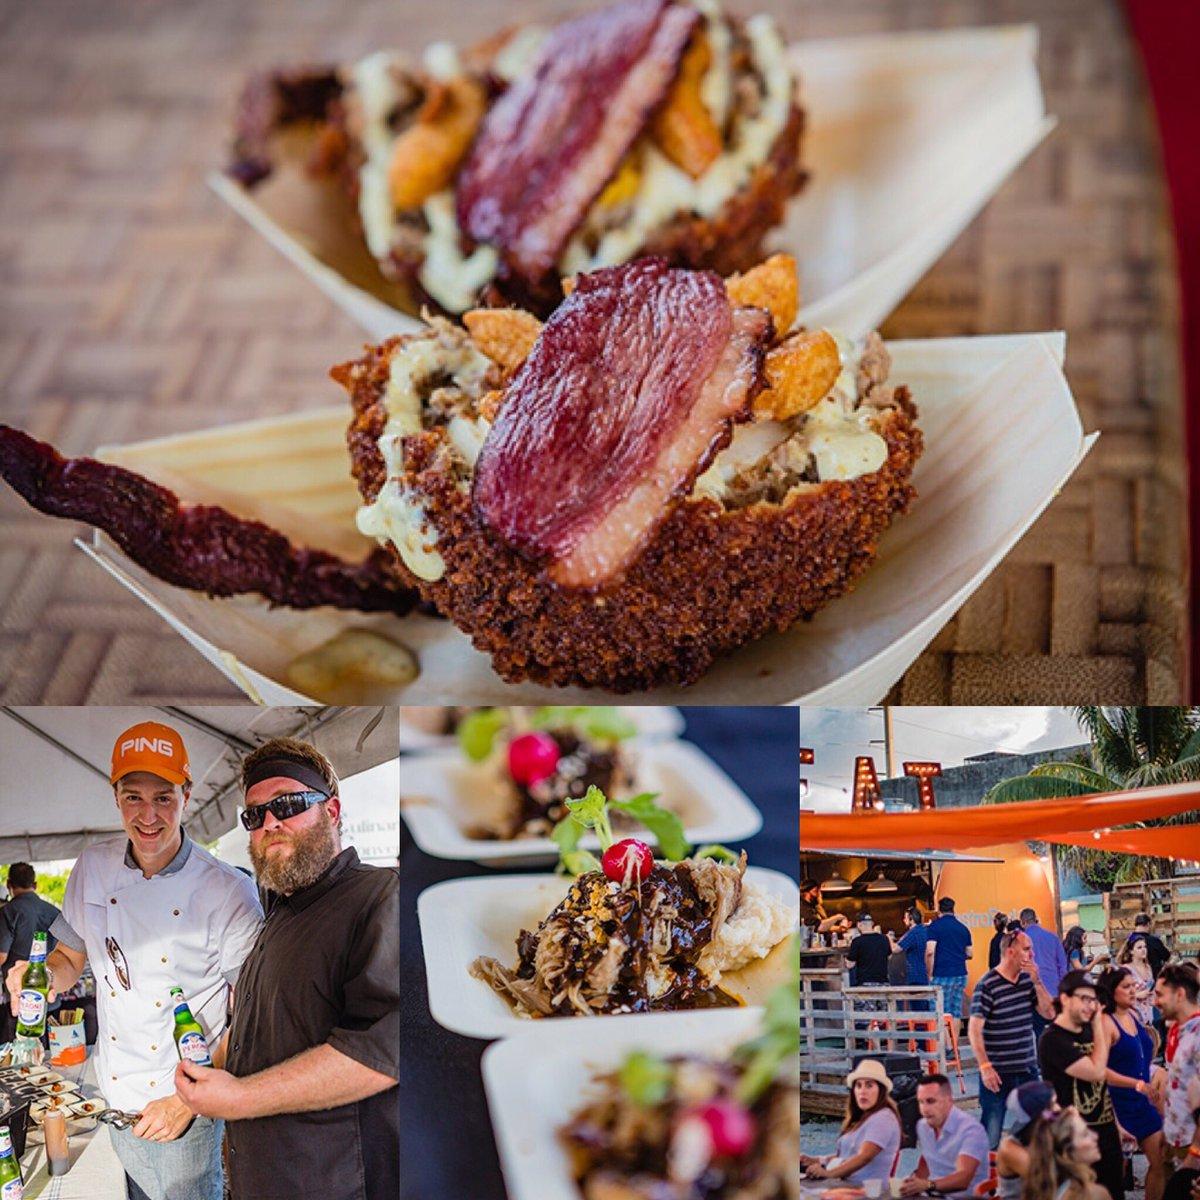 Duck Duck Goose Wows in Wynwood. Created Chef Jeremiah Bullfrog & benefitting the Epilepsy Foundation of Florida https://t.co/DOdrjbjVfI